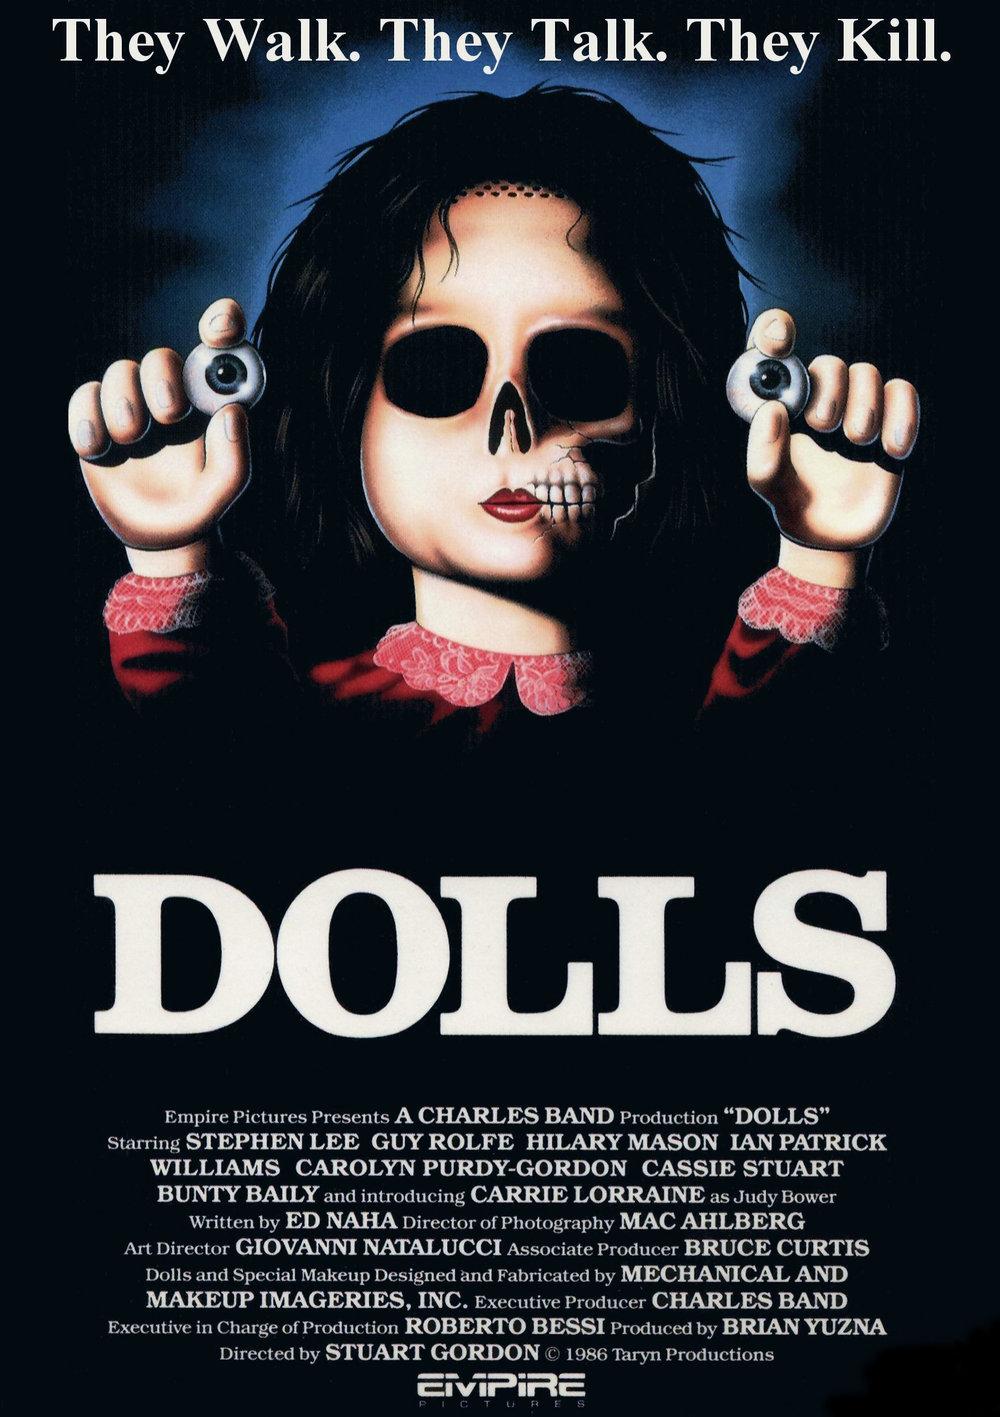 dolls-poster.jpg